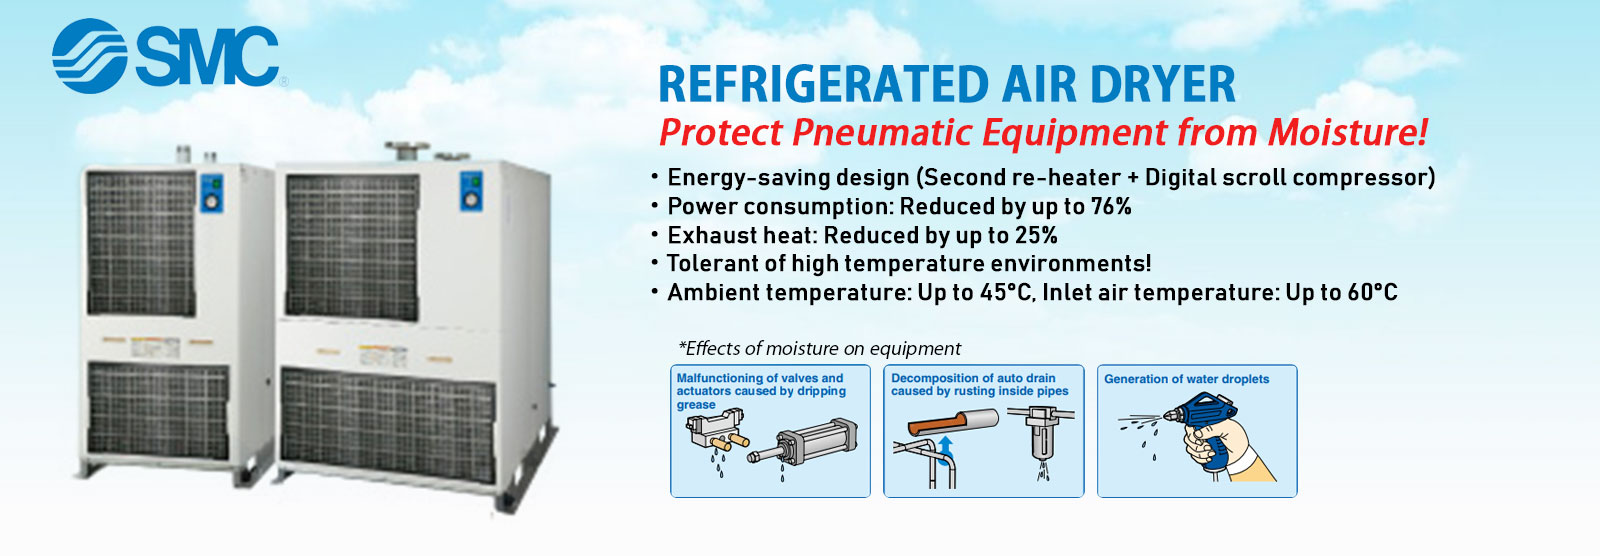 SMC Refrigated Air Dryer